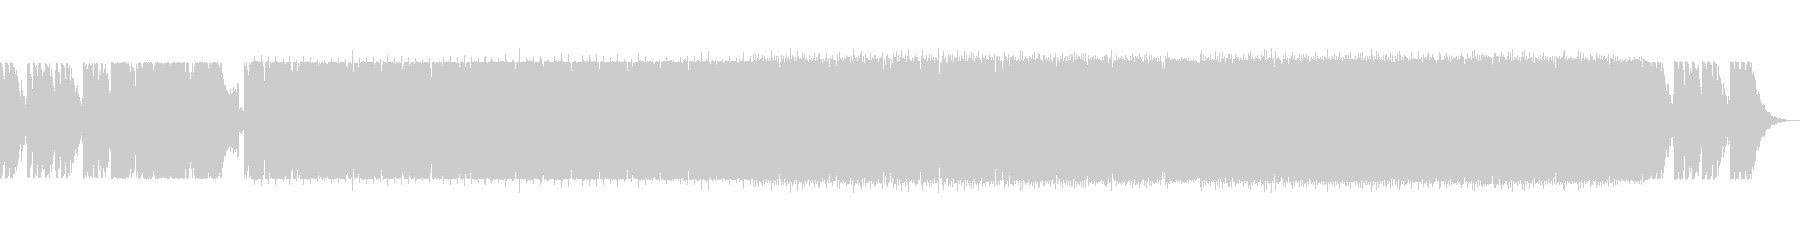 bpm121のピアノ中心のEDMの未再生の波形